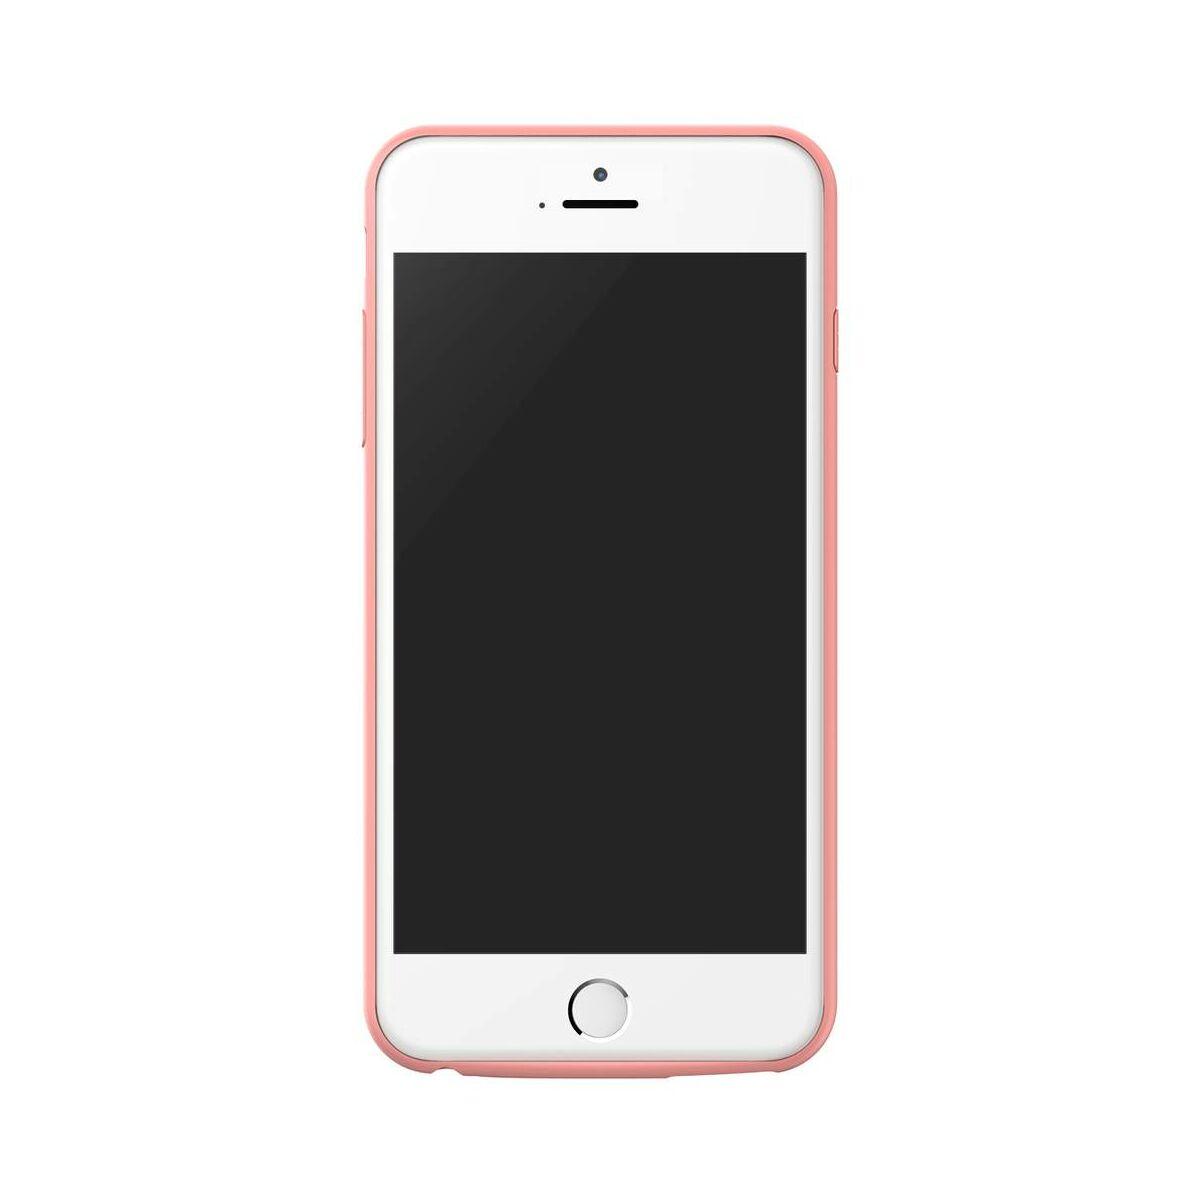 Baseus Power Bank tok, Plaid Backpack 7300 mAh iPhone 6/6s Plus, rózsaszín (ACAPIPH6SP-LBJ04)